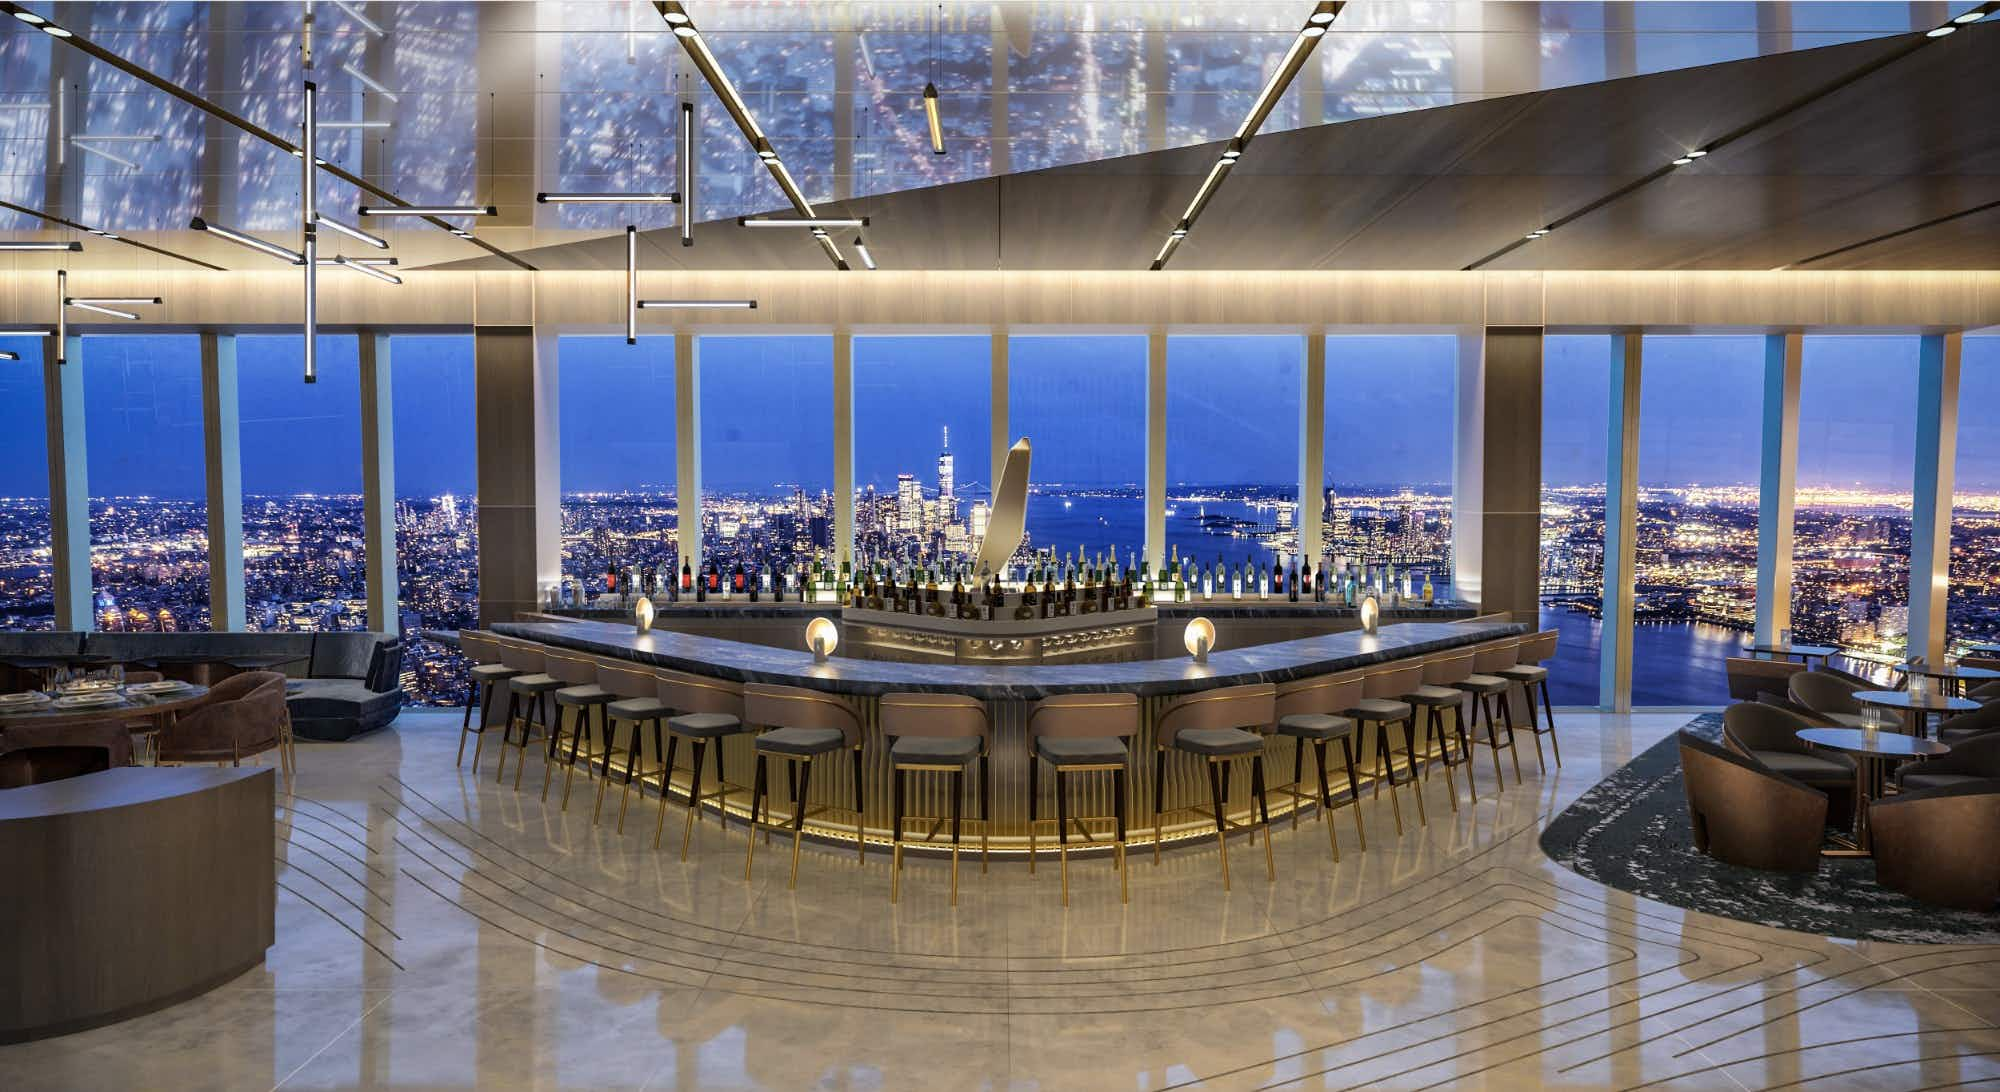 Peak will offer diners spectacular views © Peak